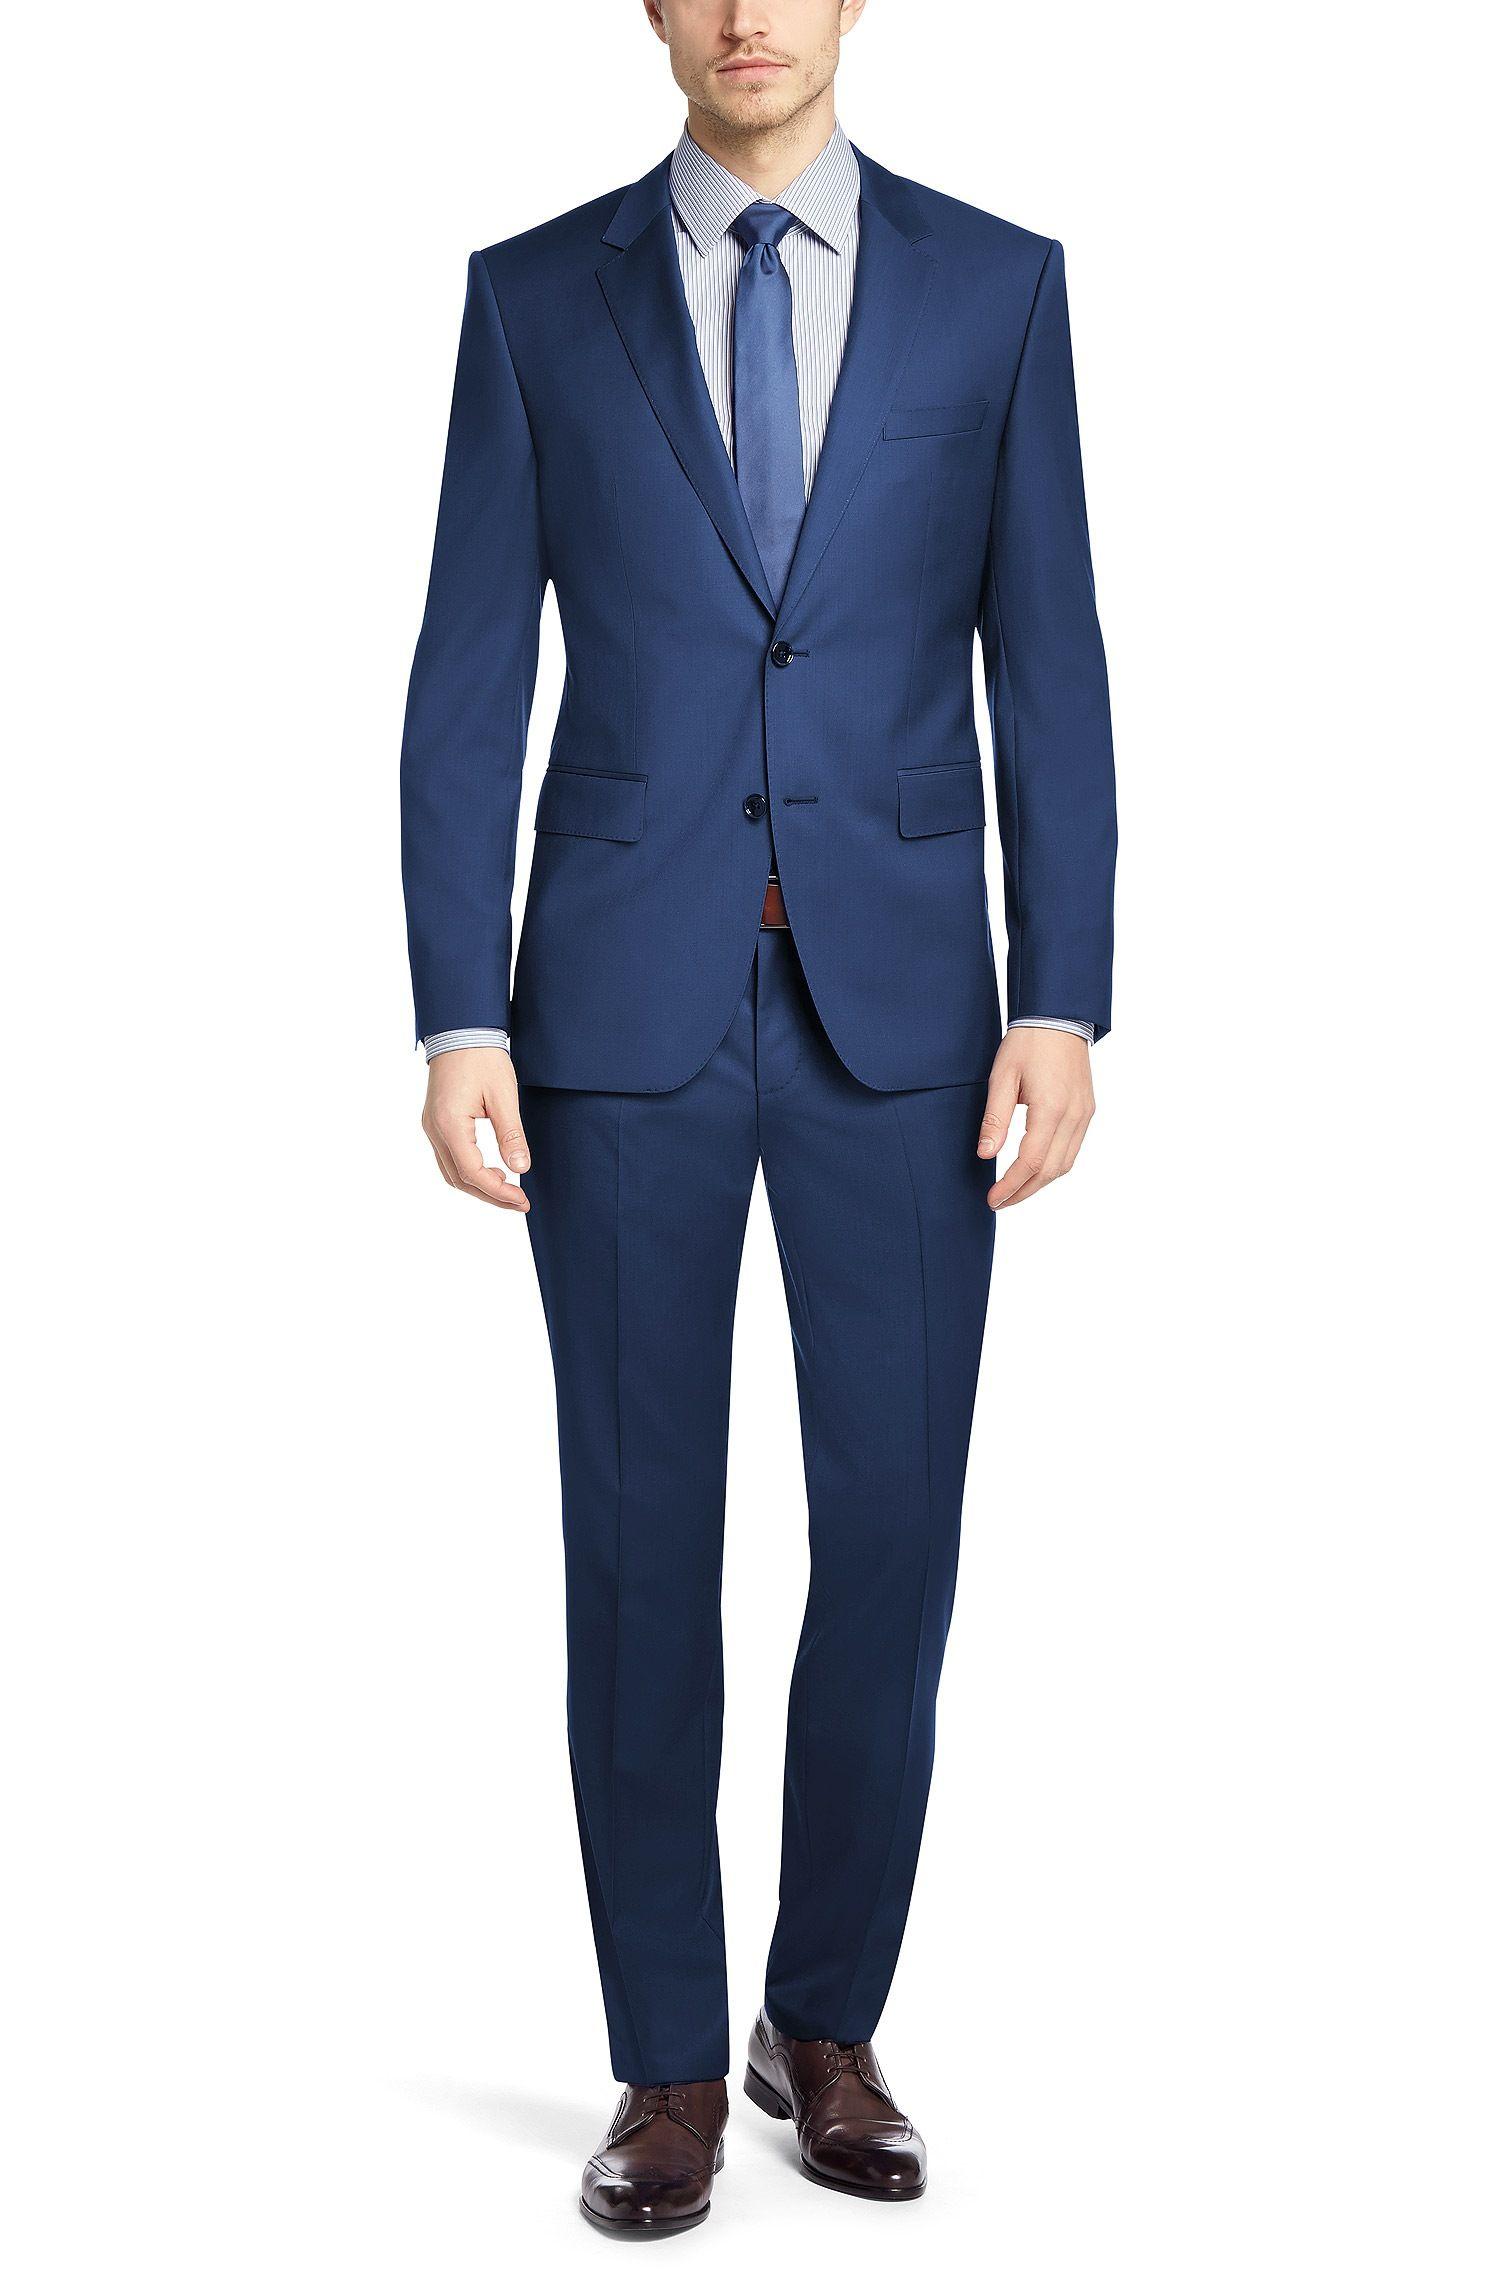 Clothing, Shoes & Accessories Men's Clothing Ingenious Veste Homme Hugo Boss En Laine Vierge